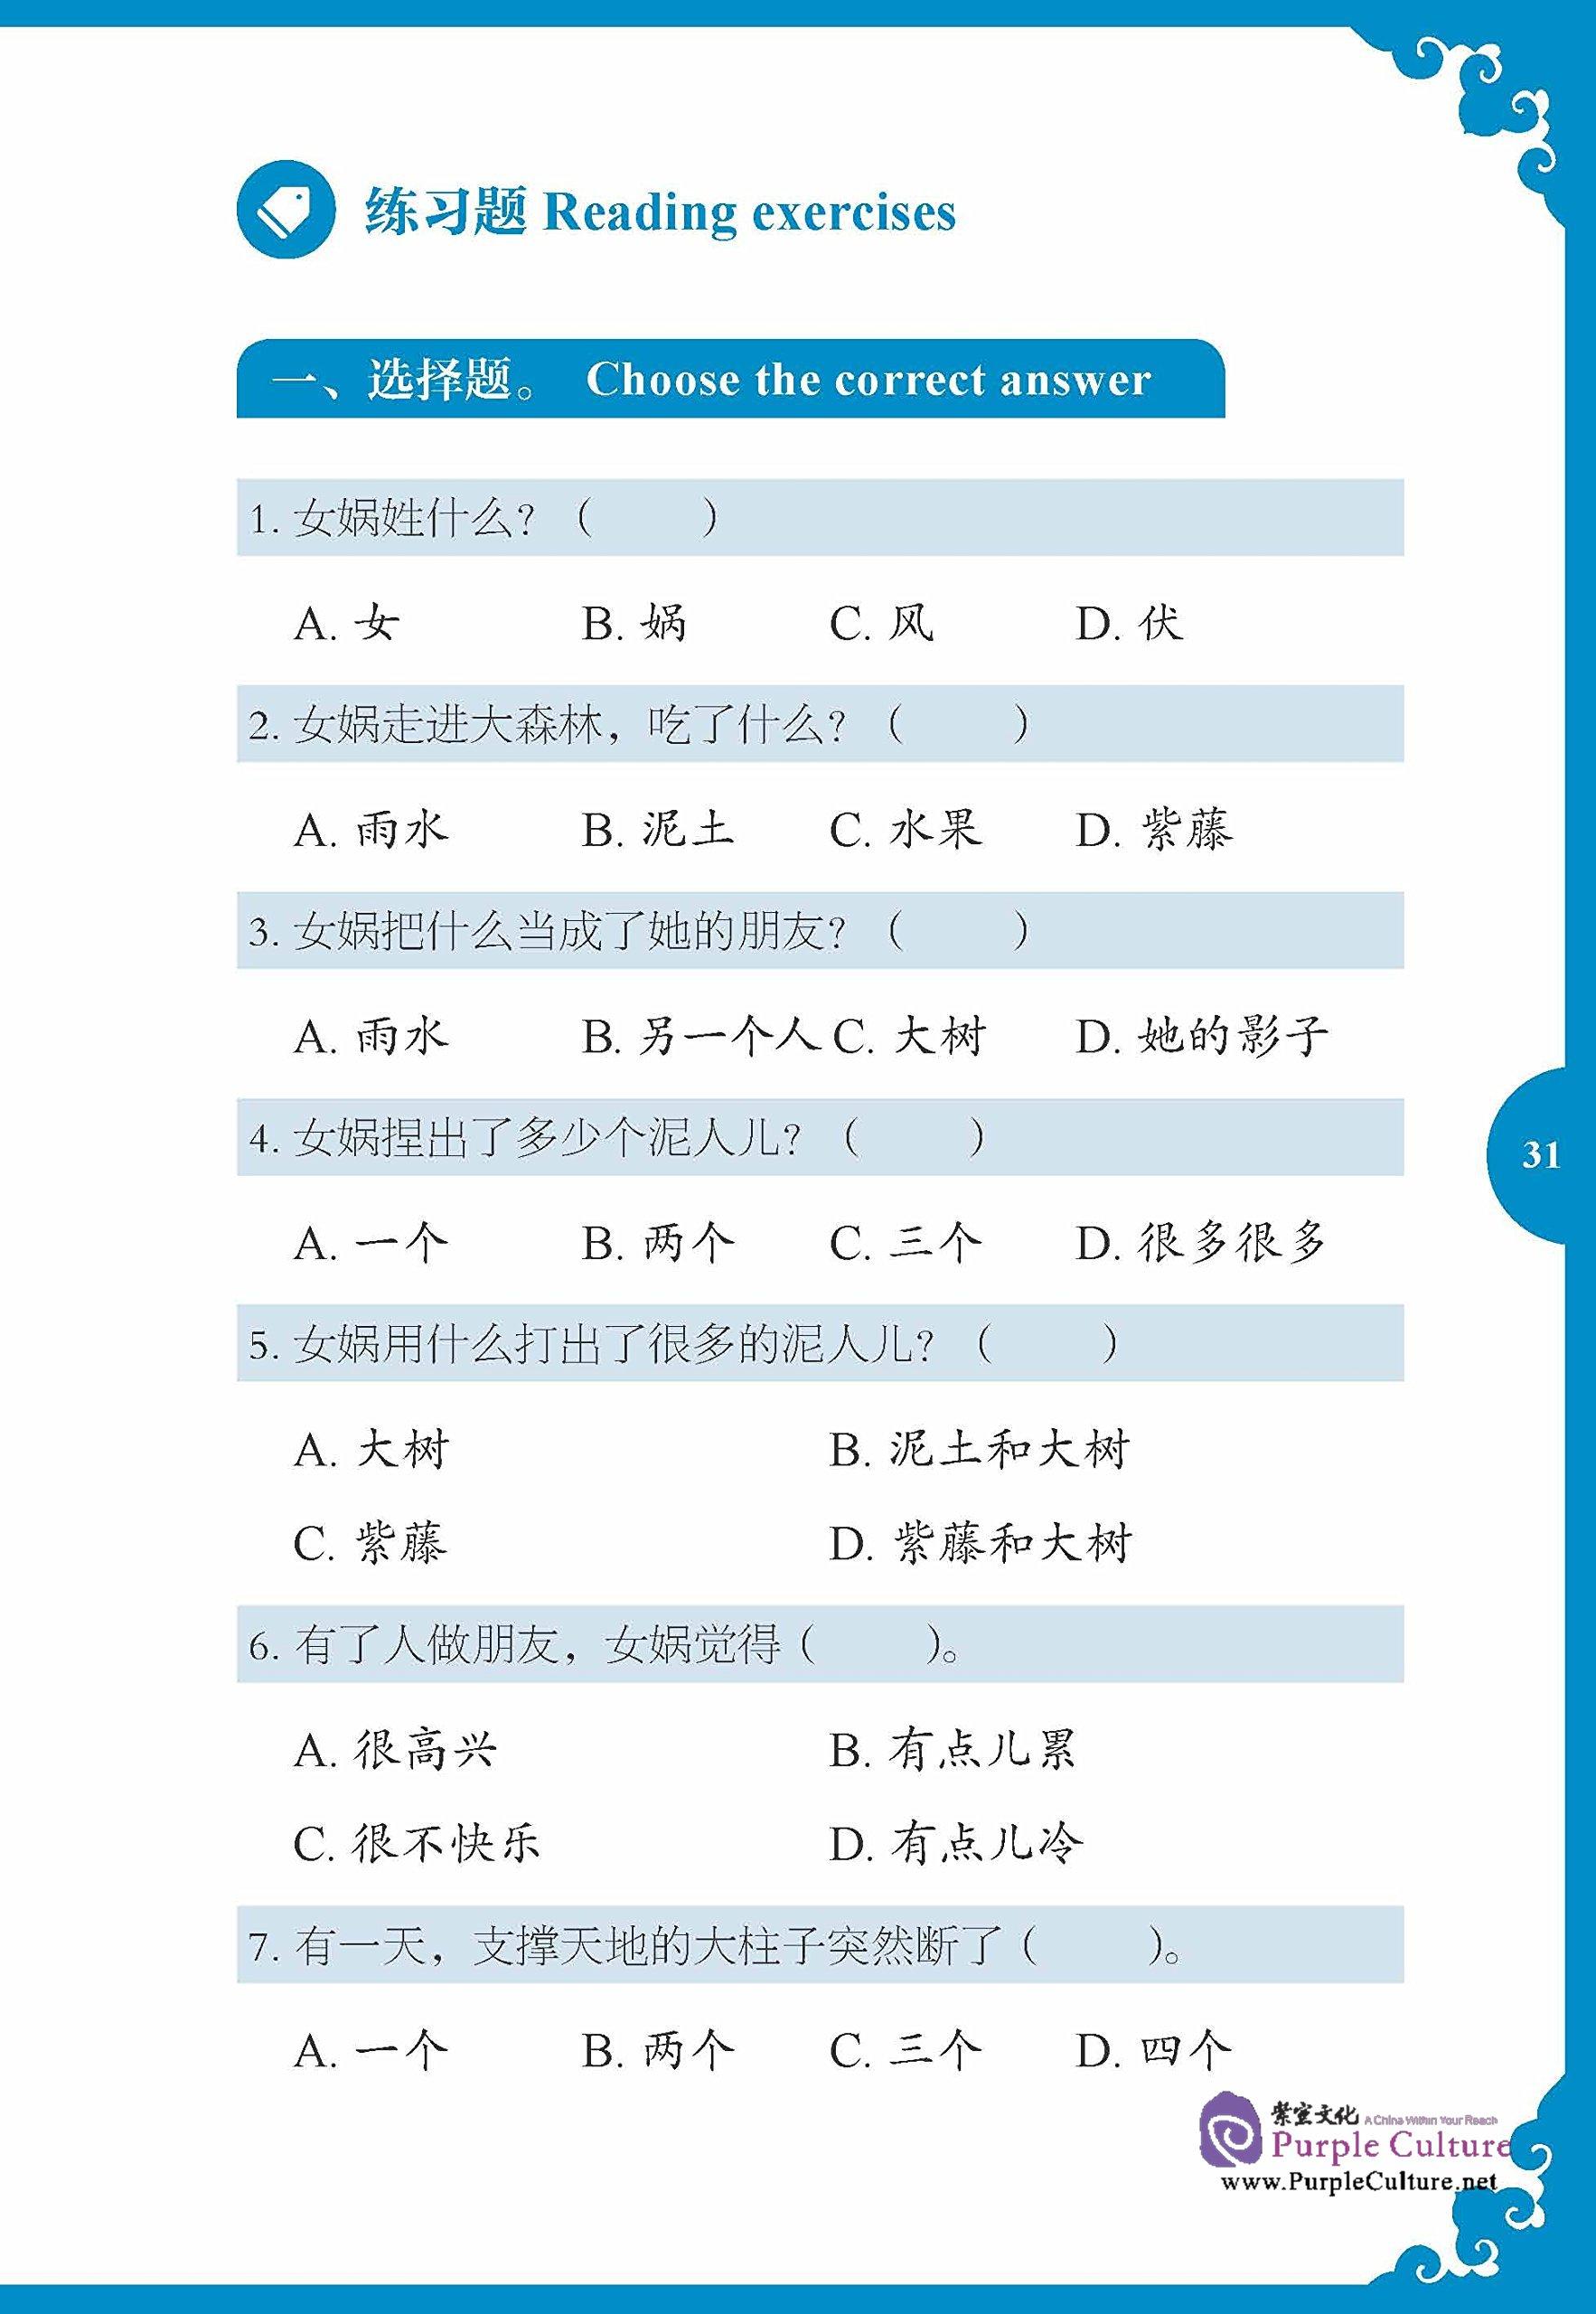 Rainbow Bridge Graded Chinese Reader Level 1 300